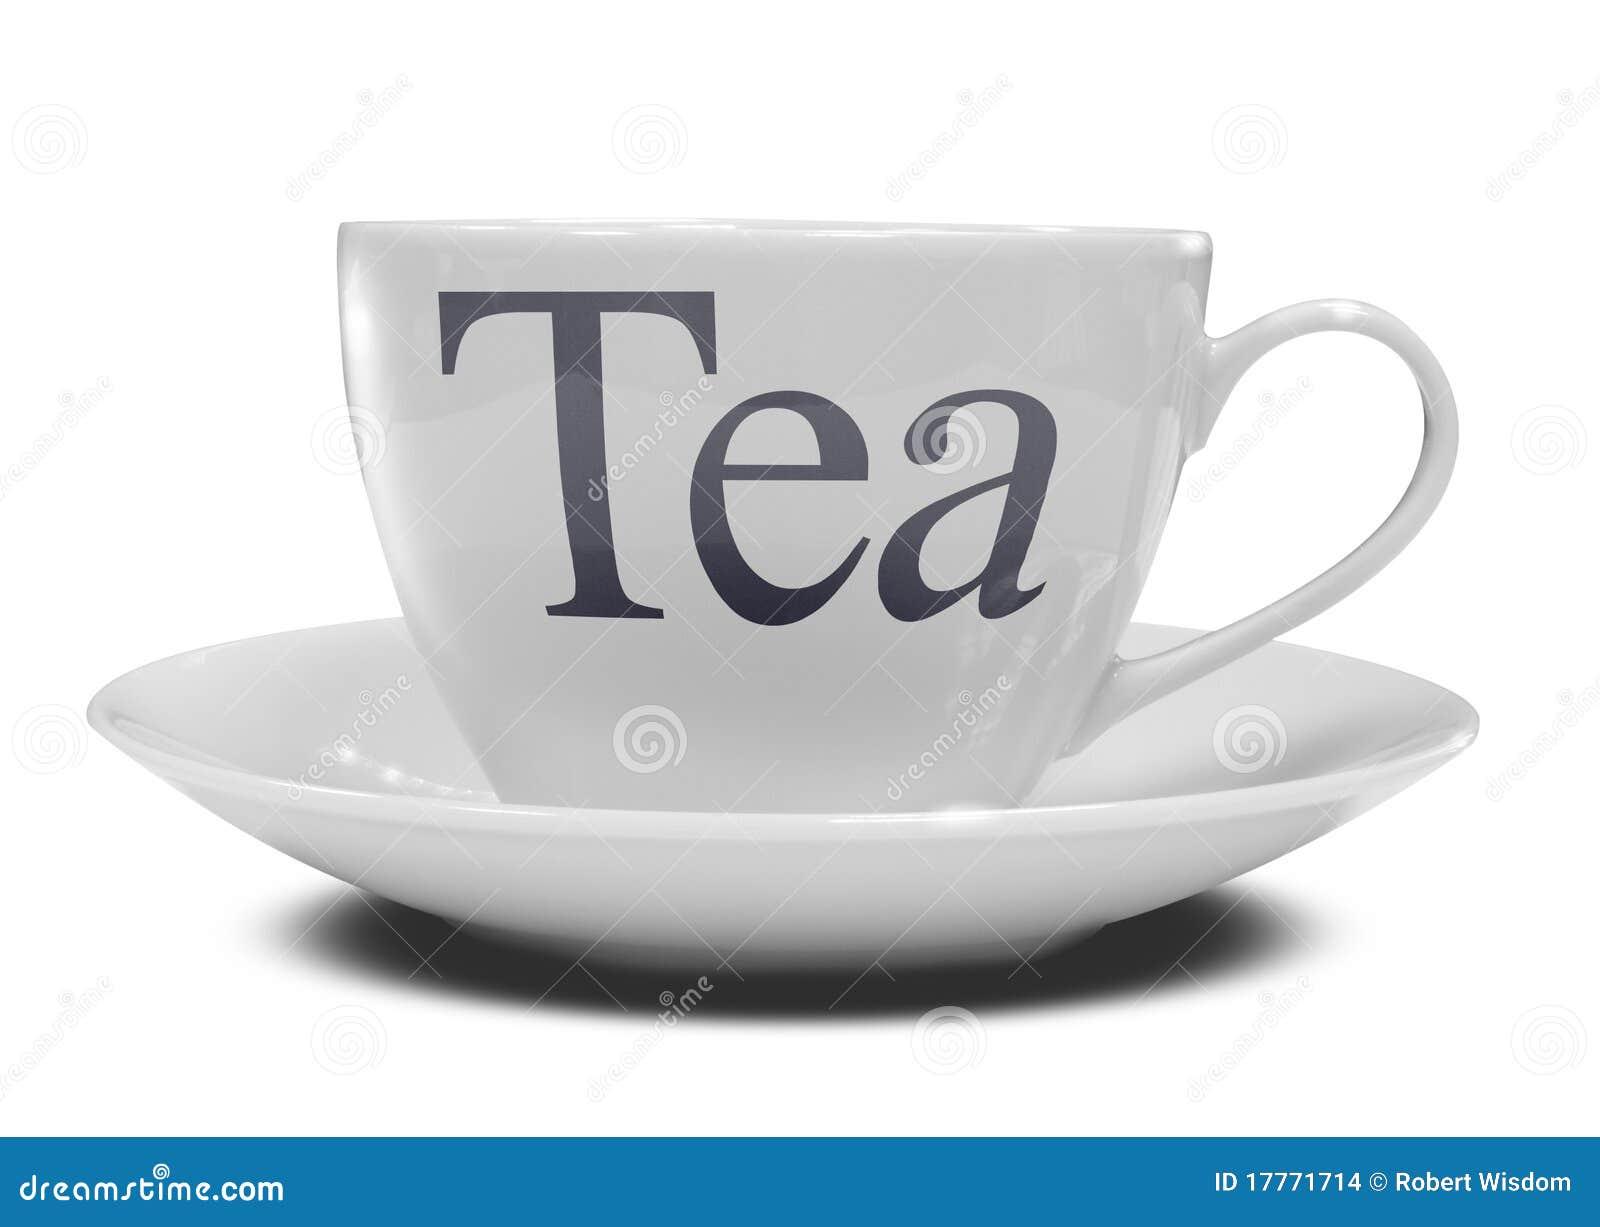 [Image: cup-tea-2-17771714.jpg]